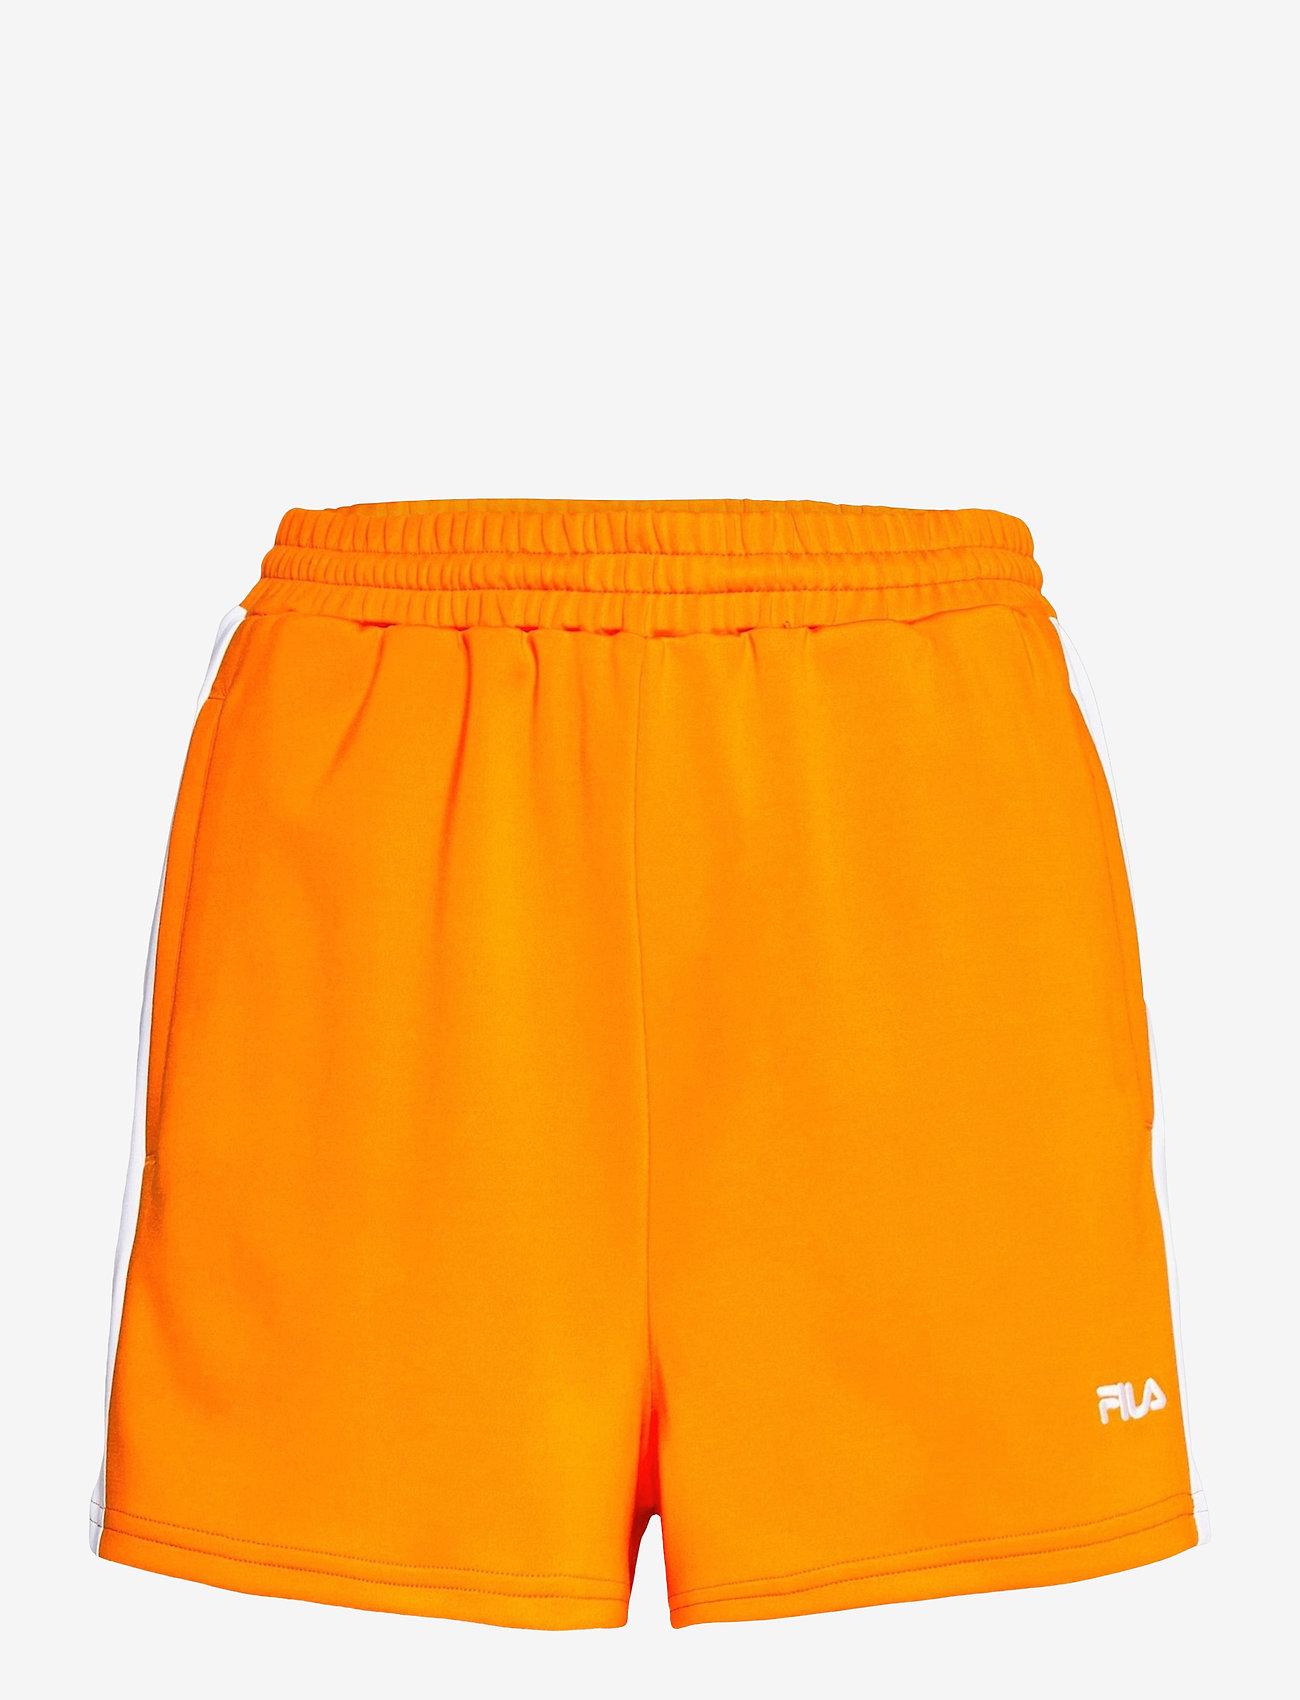 FILA - WOMEN ALLETE high waist shorts - chaussures de course - flame orange-bright white - 0